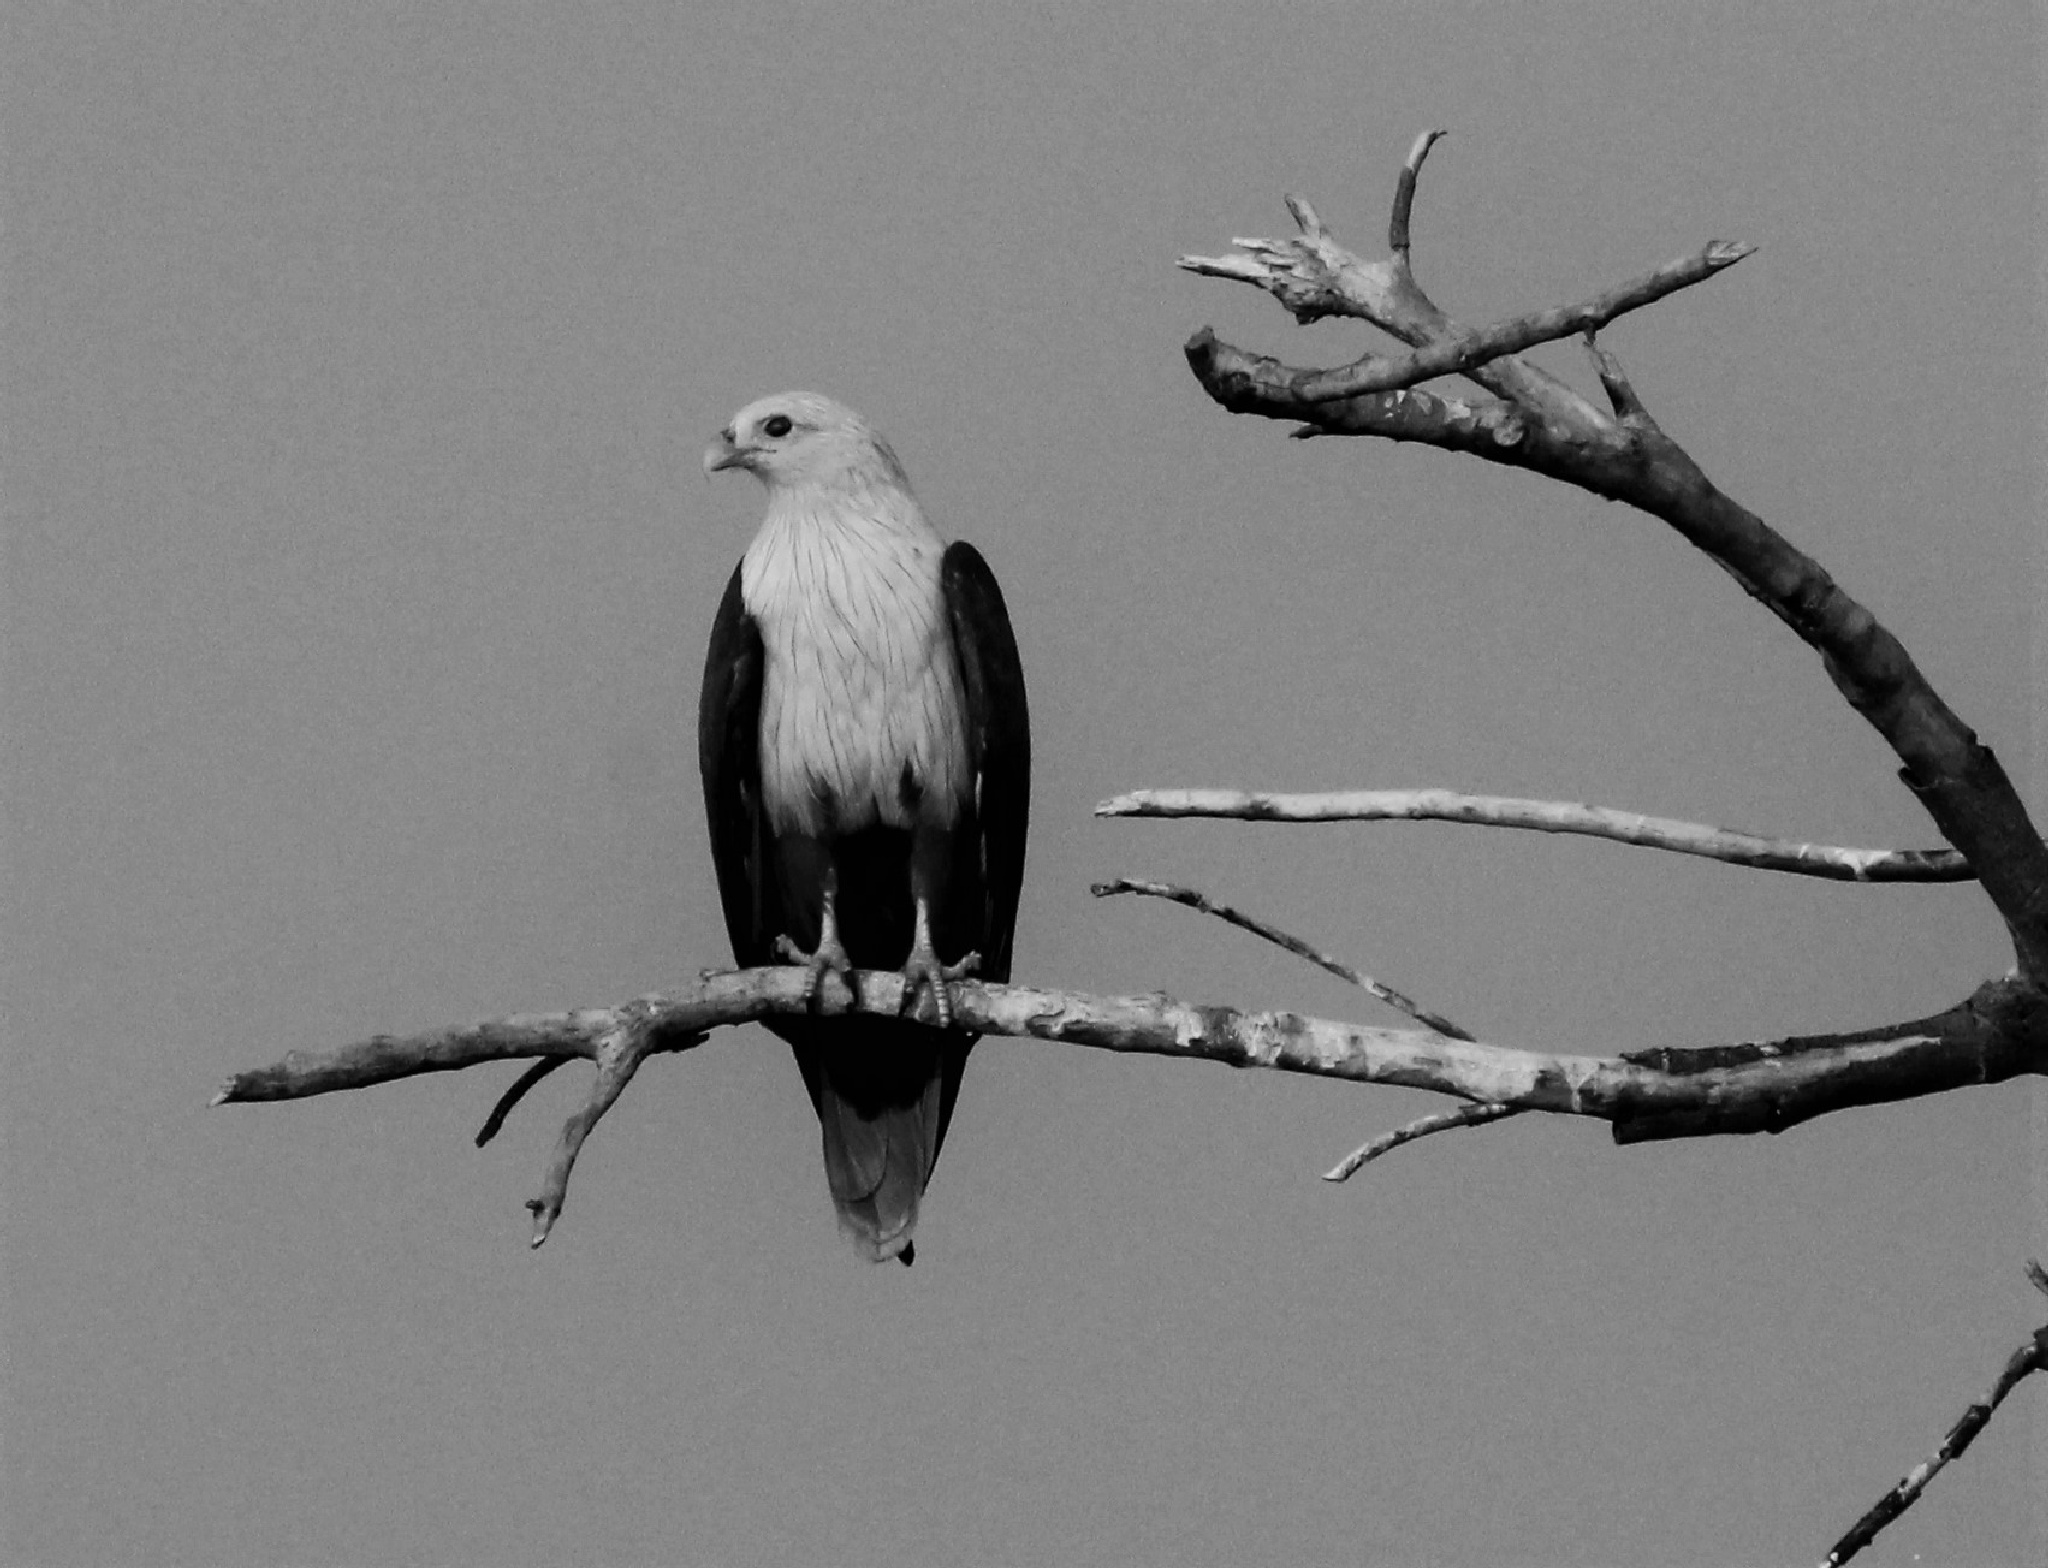 Brahminy Kite, Monochrome by Sanjay Sinhasane